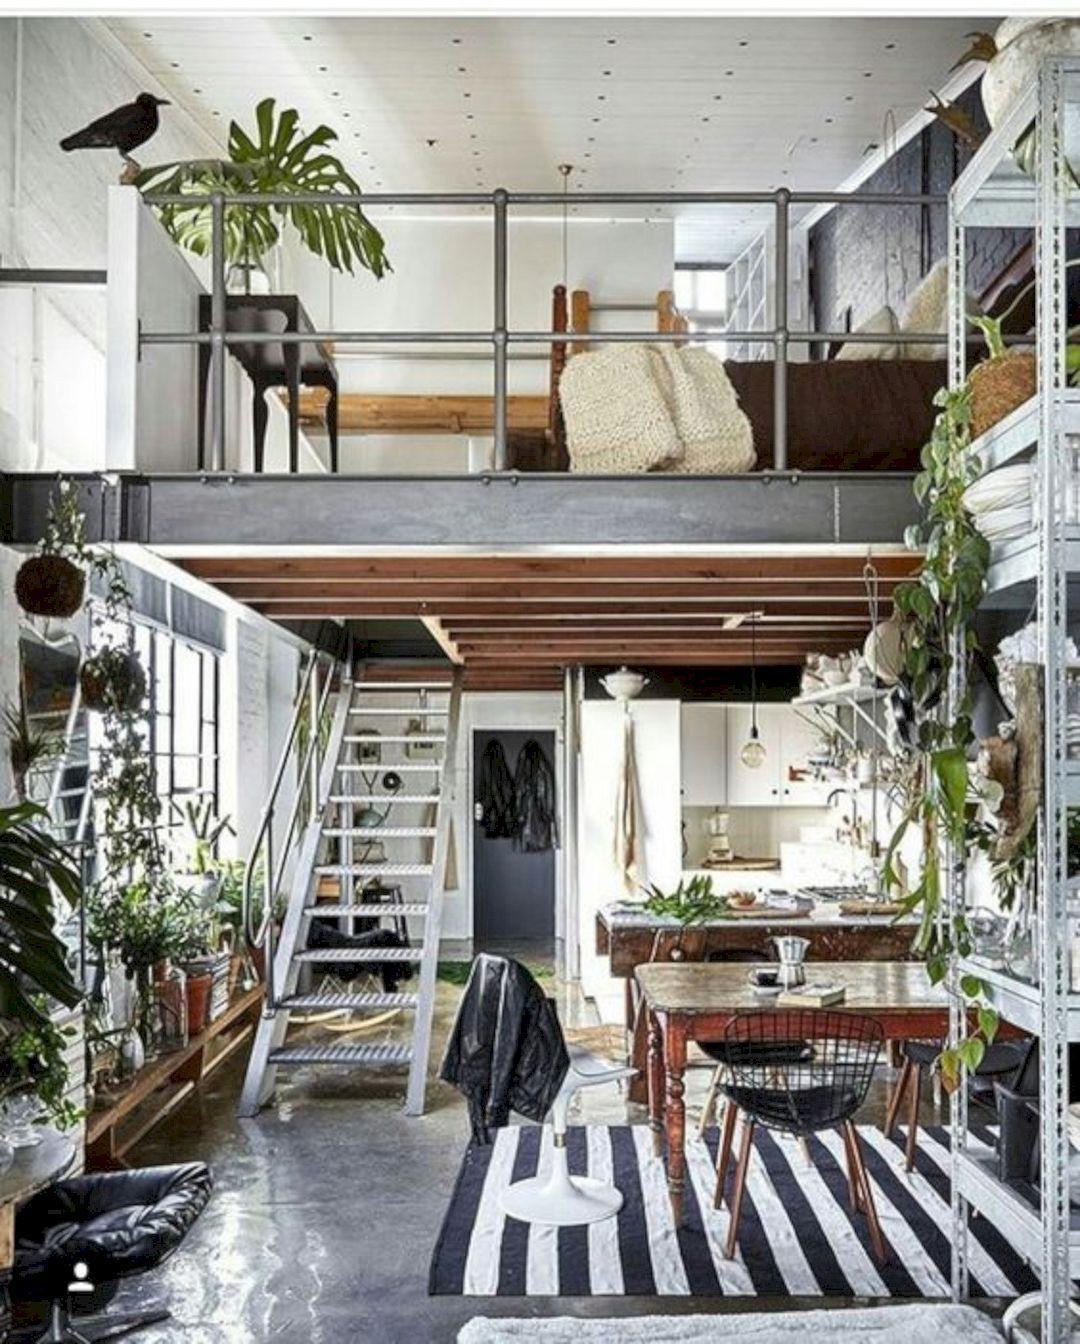 amazing interior design ideas for modern loft https futuristarchitecture also astonishing cool tips industrial house barn table square rh pinterest